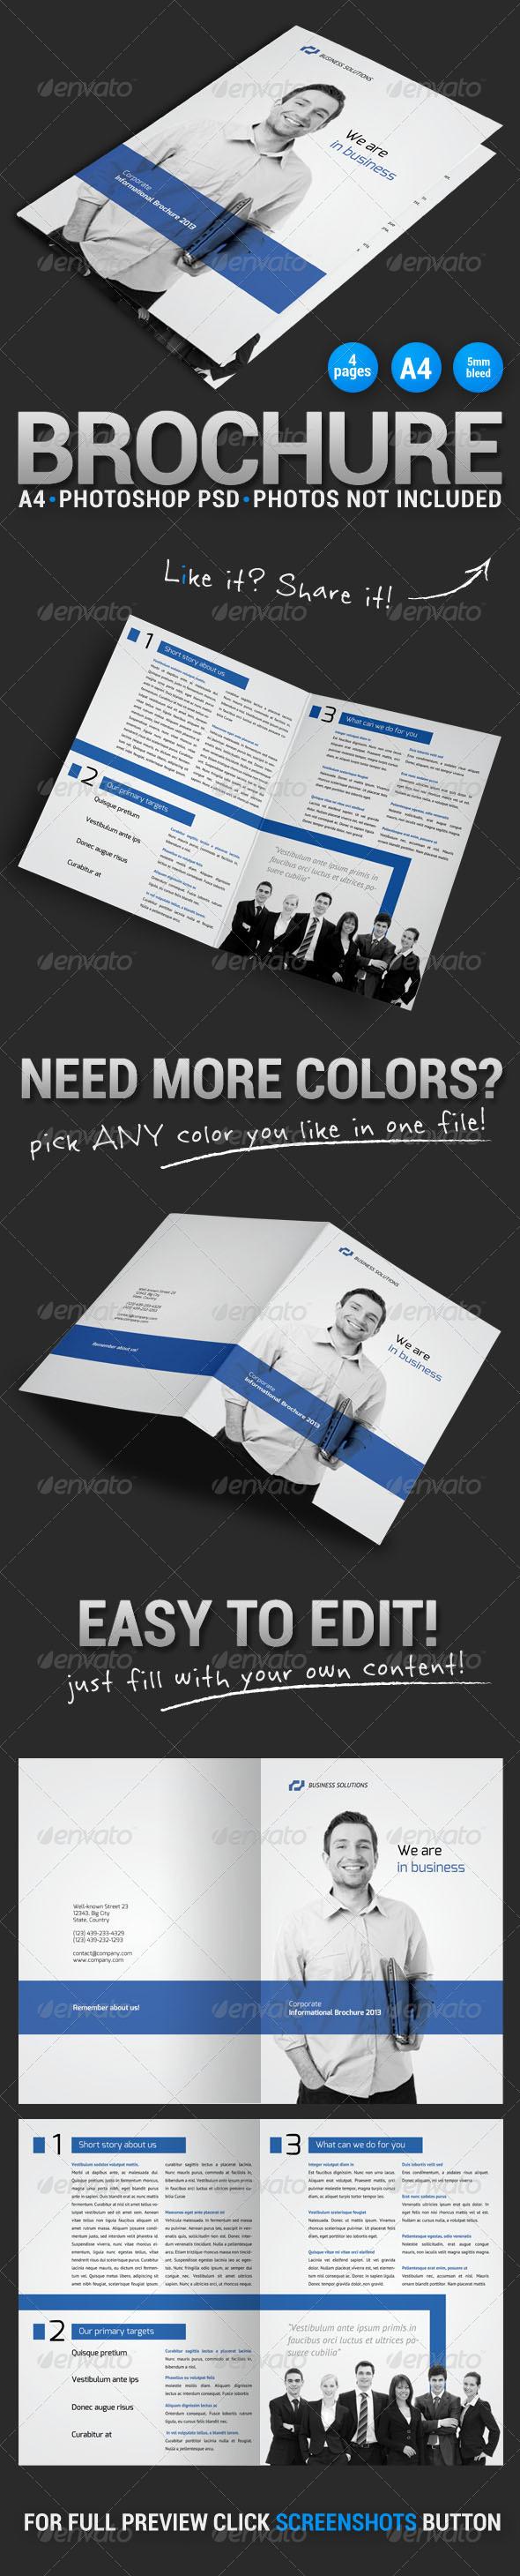 GraphicRiver Bi-Fold Brochure 6 5363280